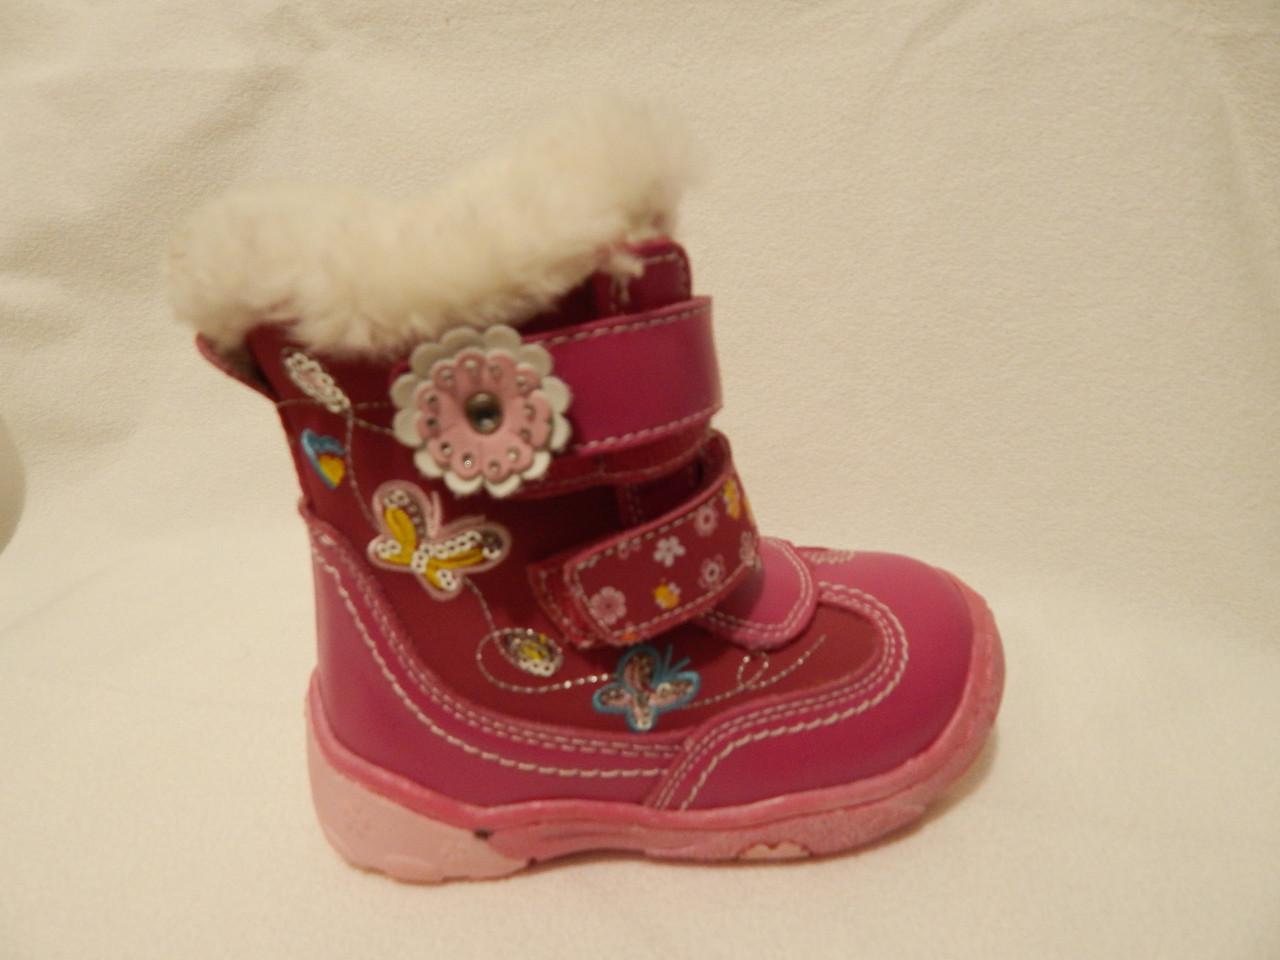 Зимние сапоги детские для девочки ТМ Шалунишка